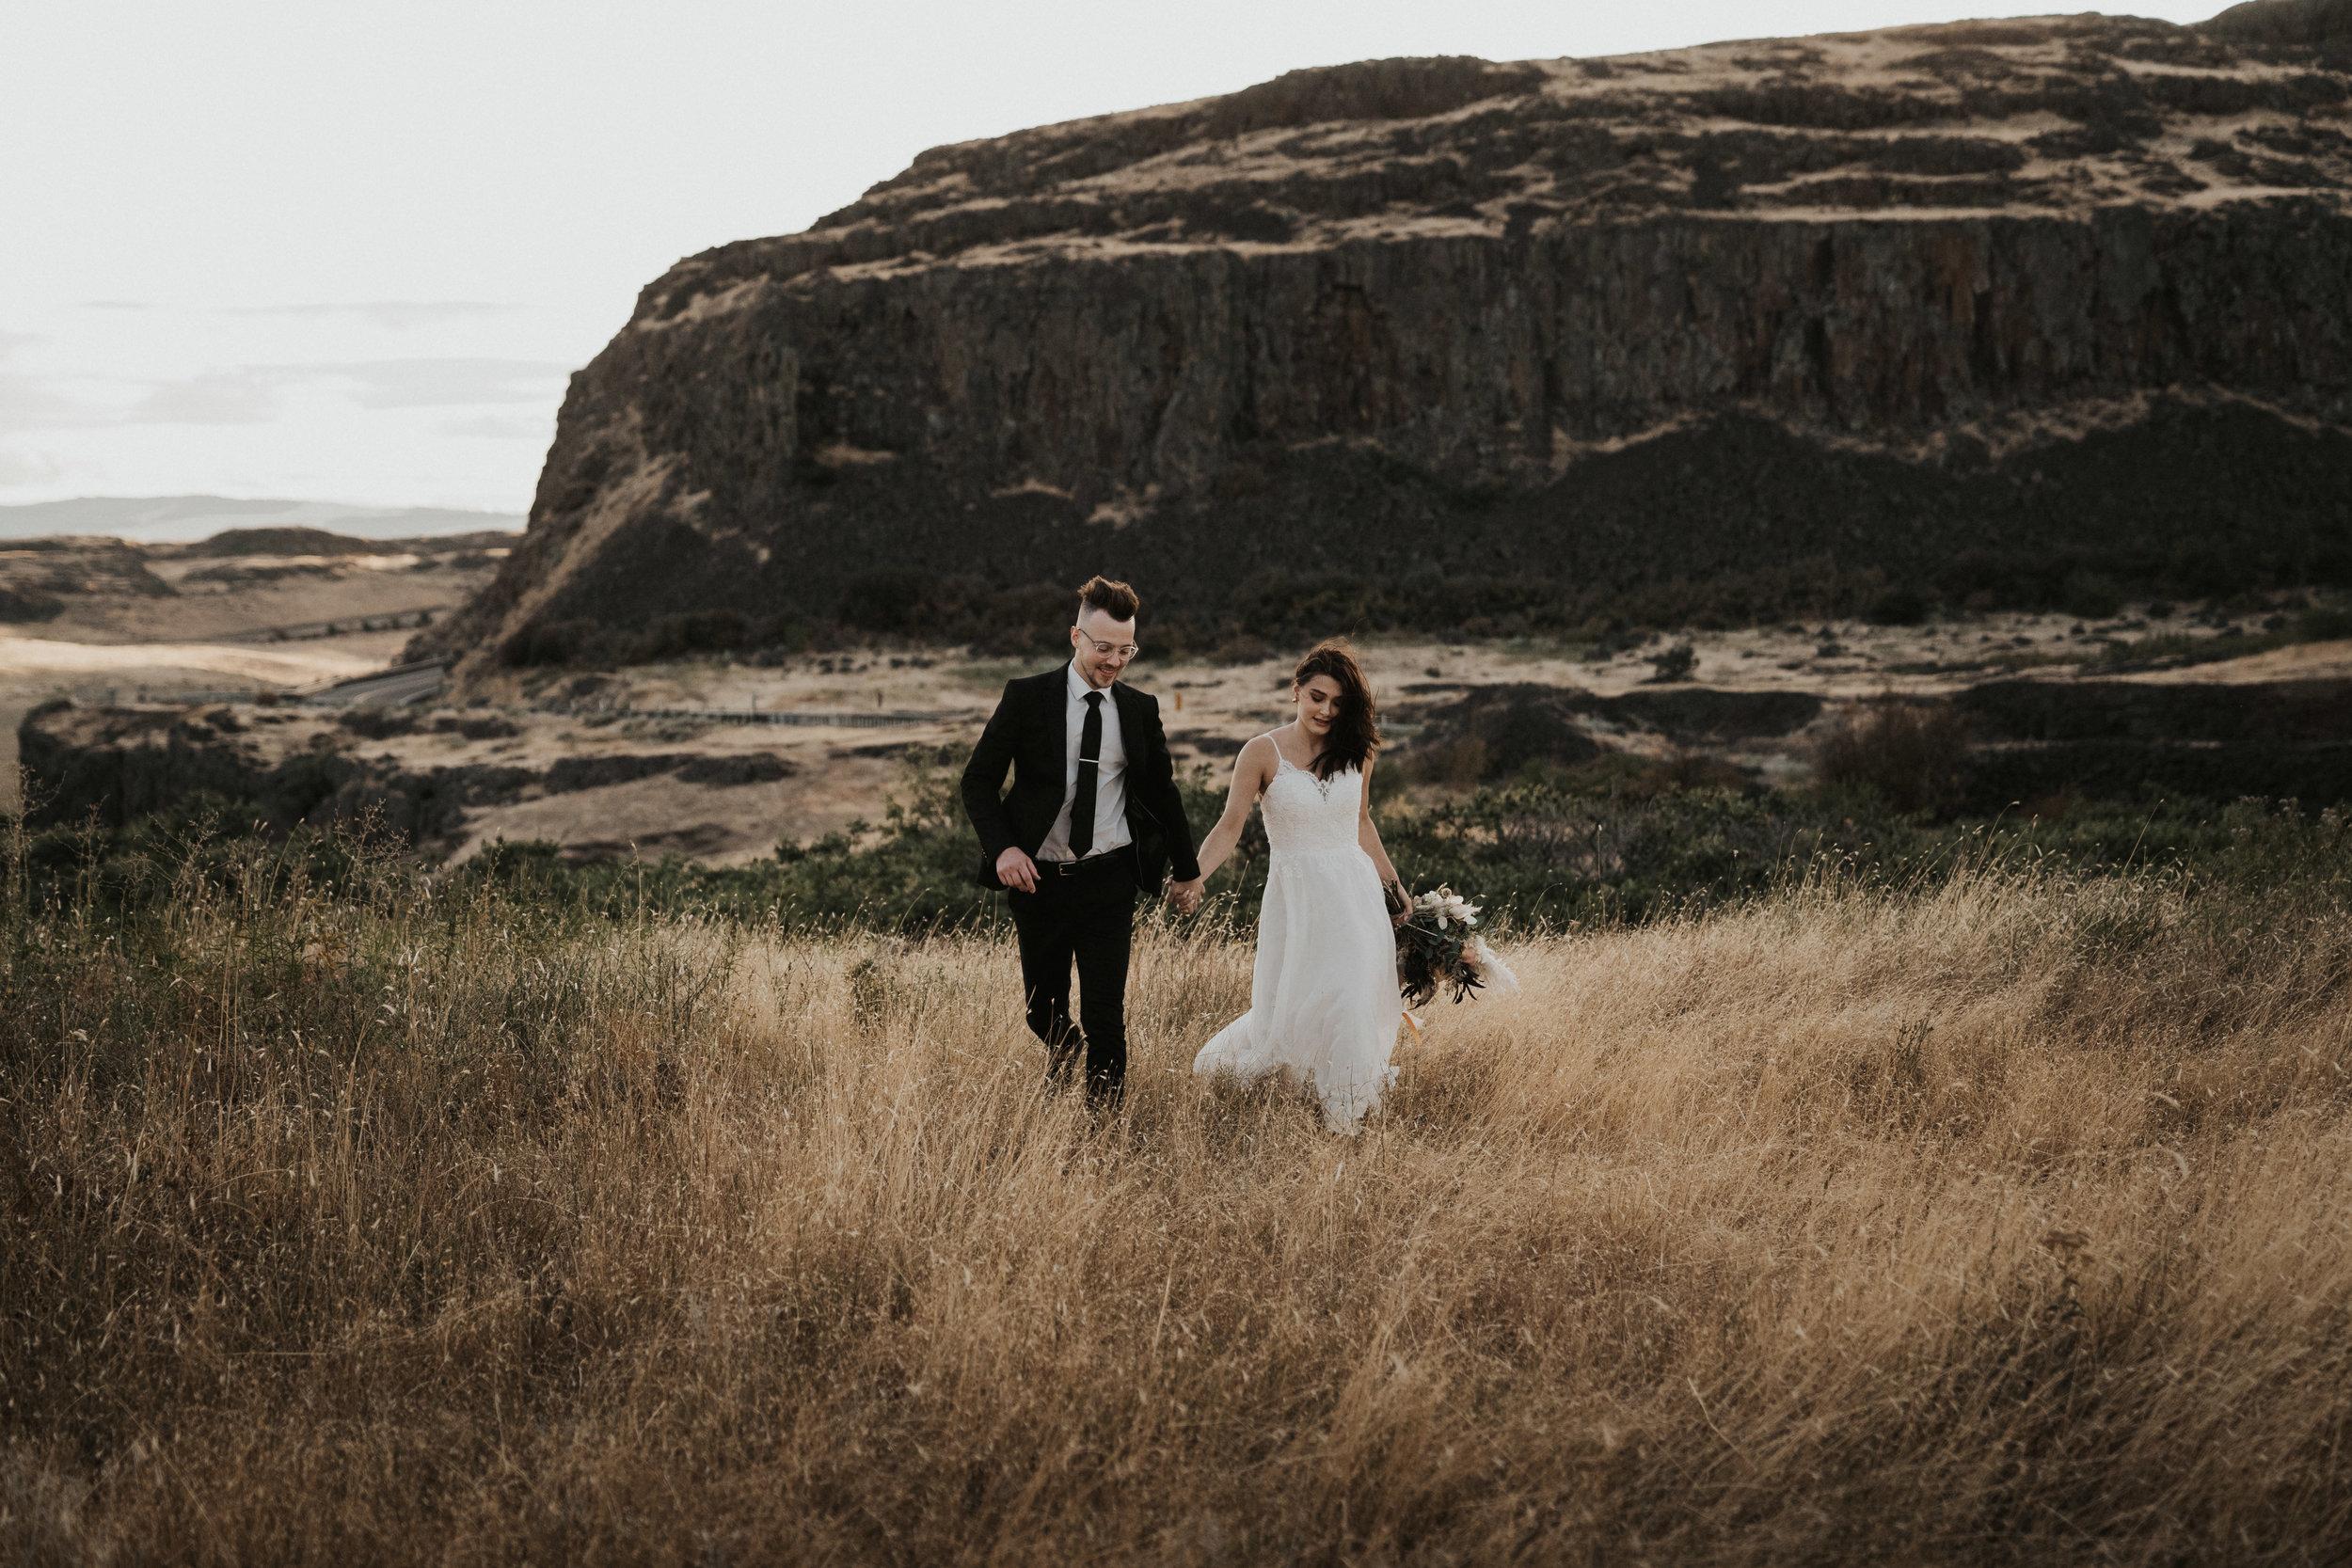 columbia-river-gorge-wedding-elopement-inspiration-15.jpg